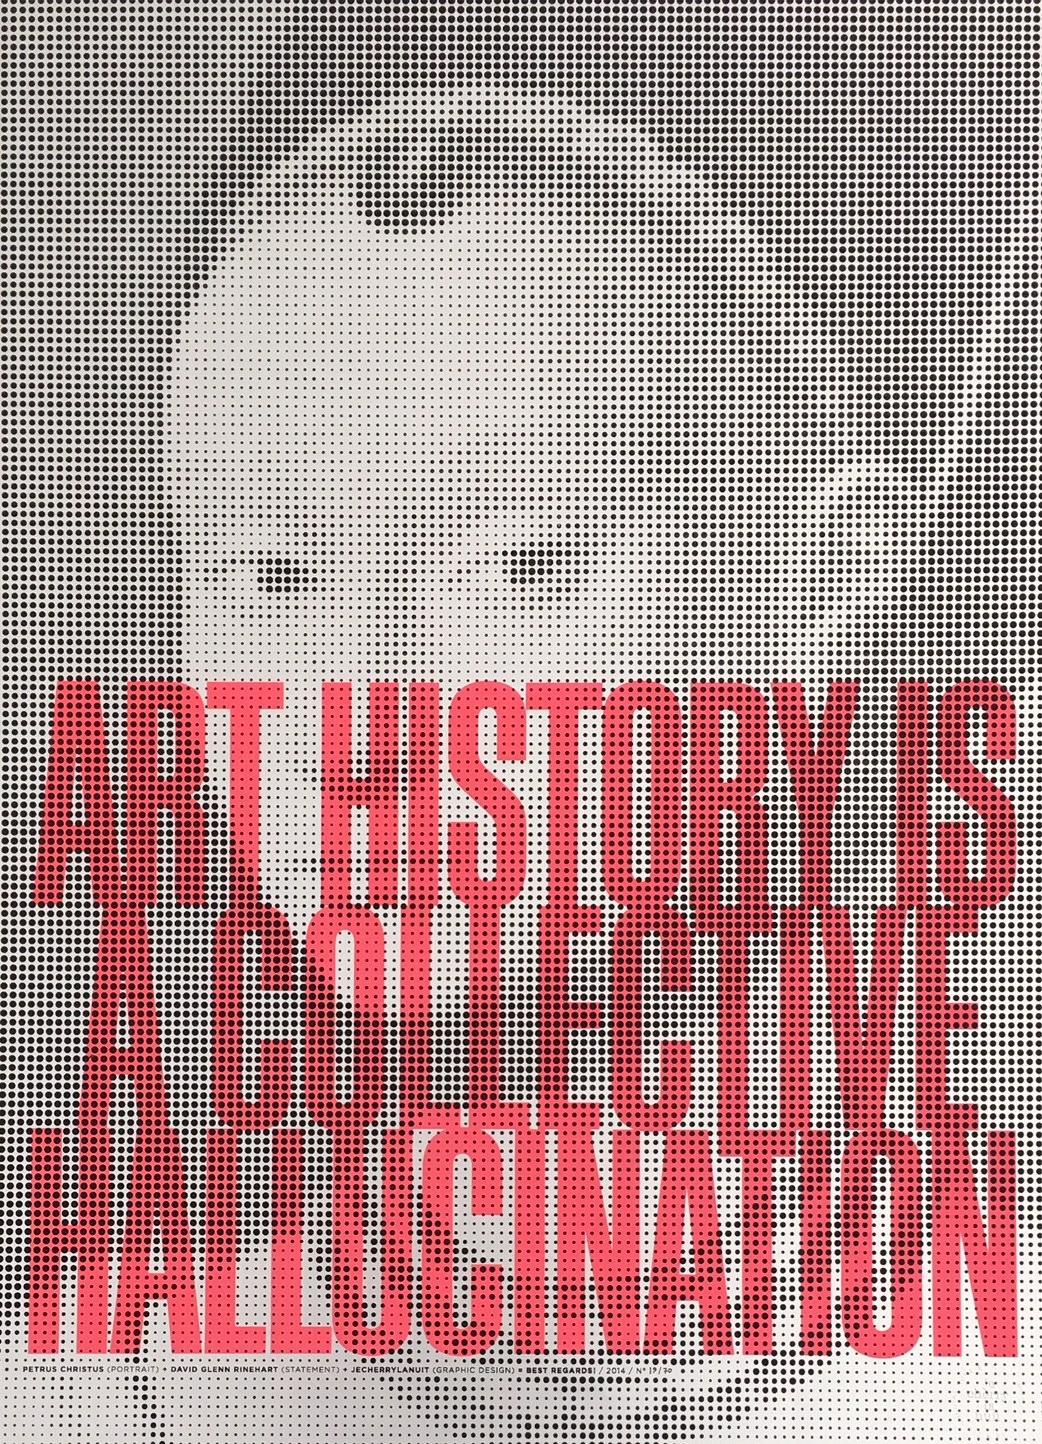 Petrus Christus Art History Original Vintage Poster